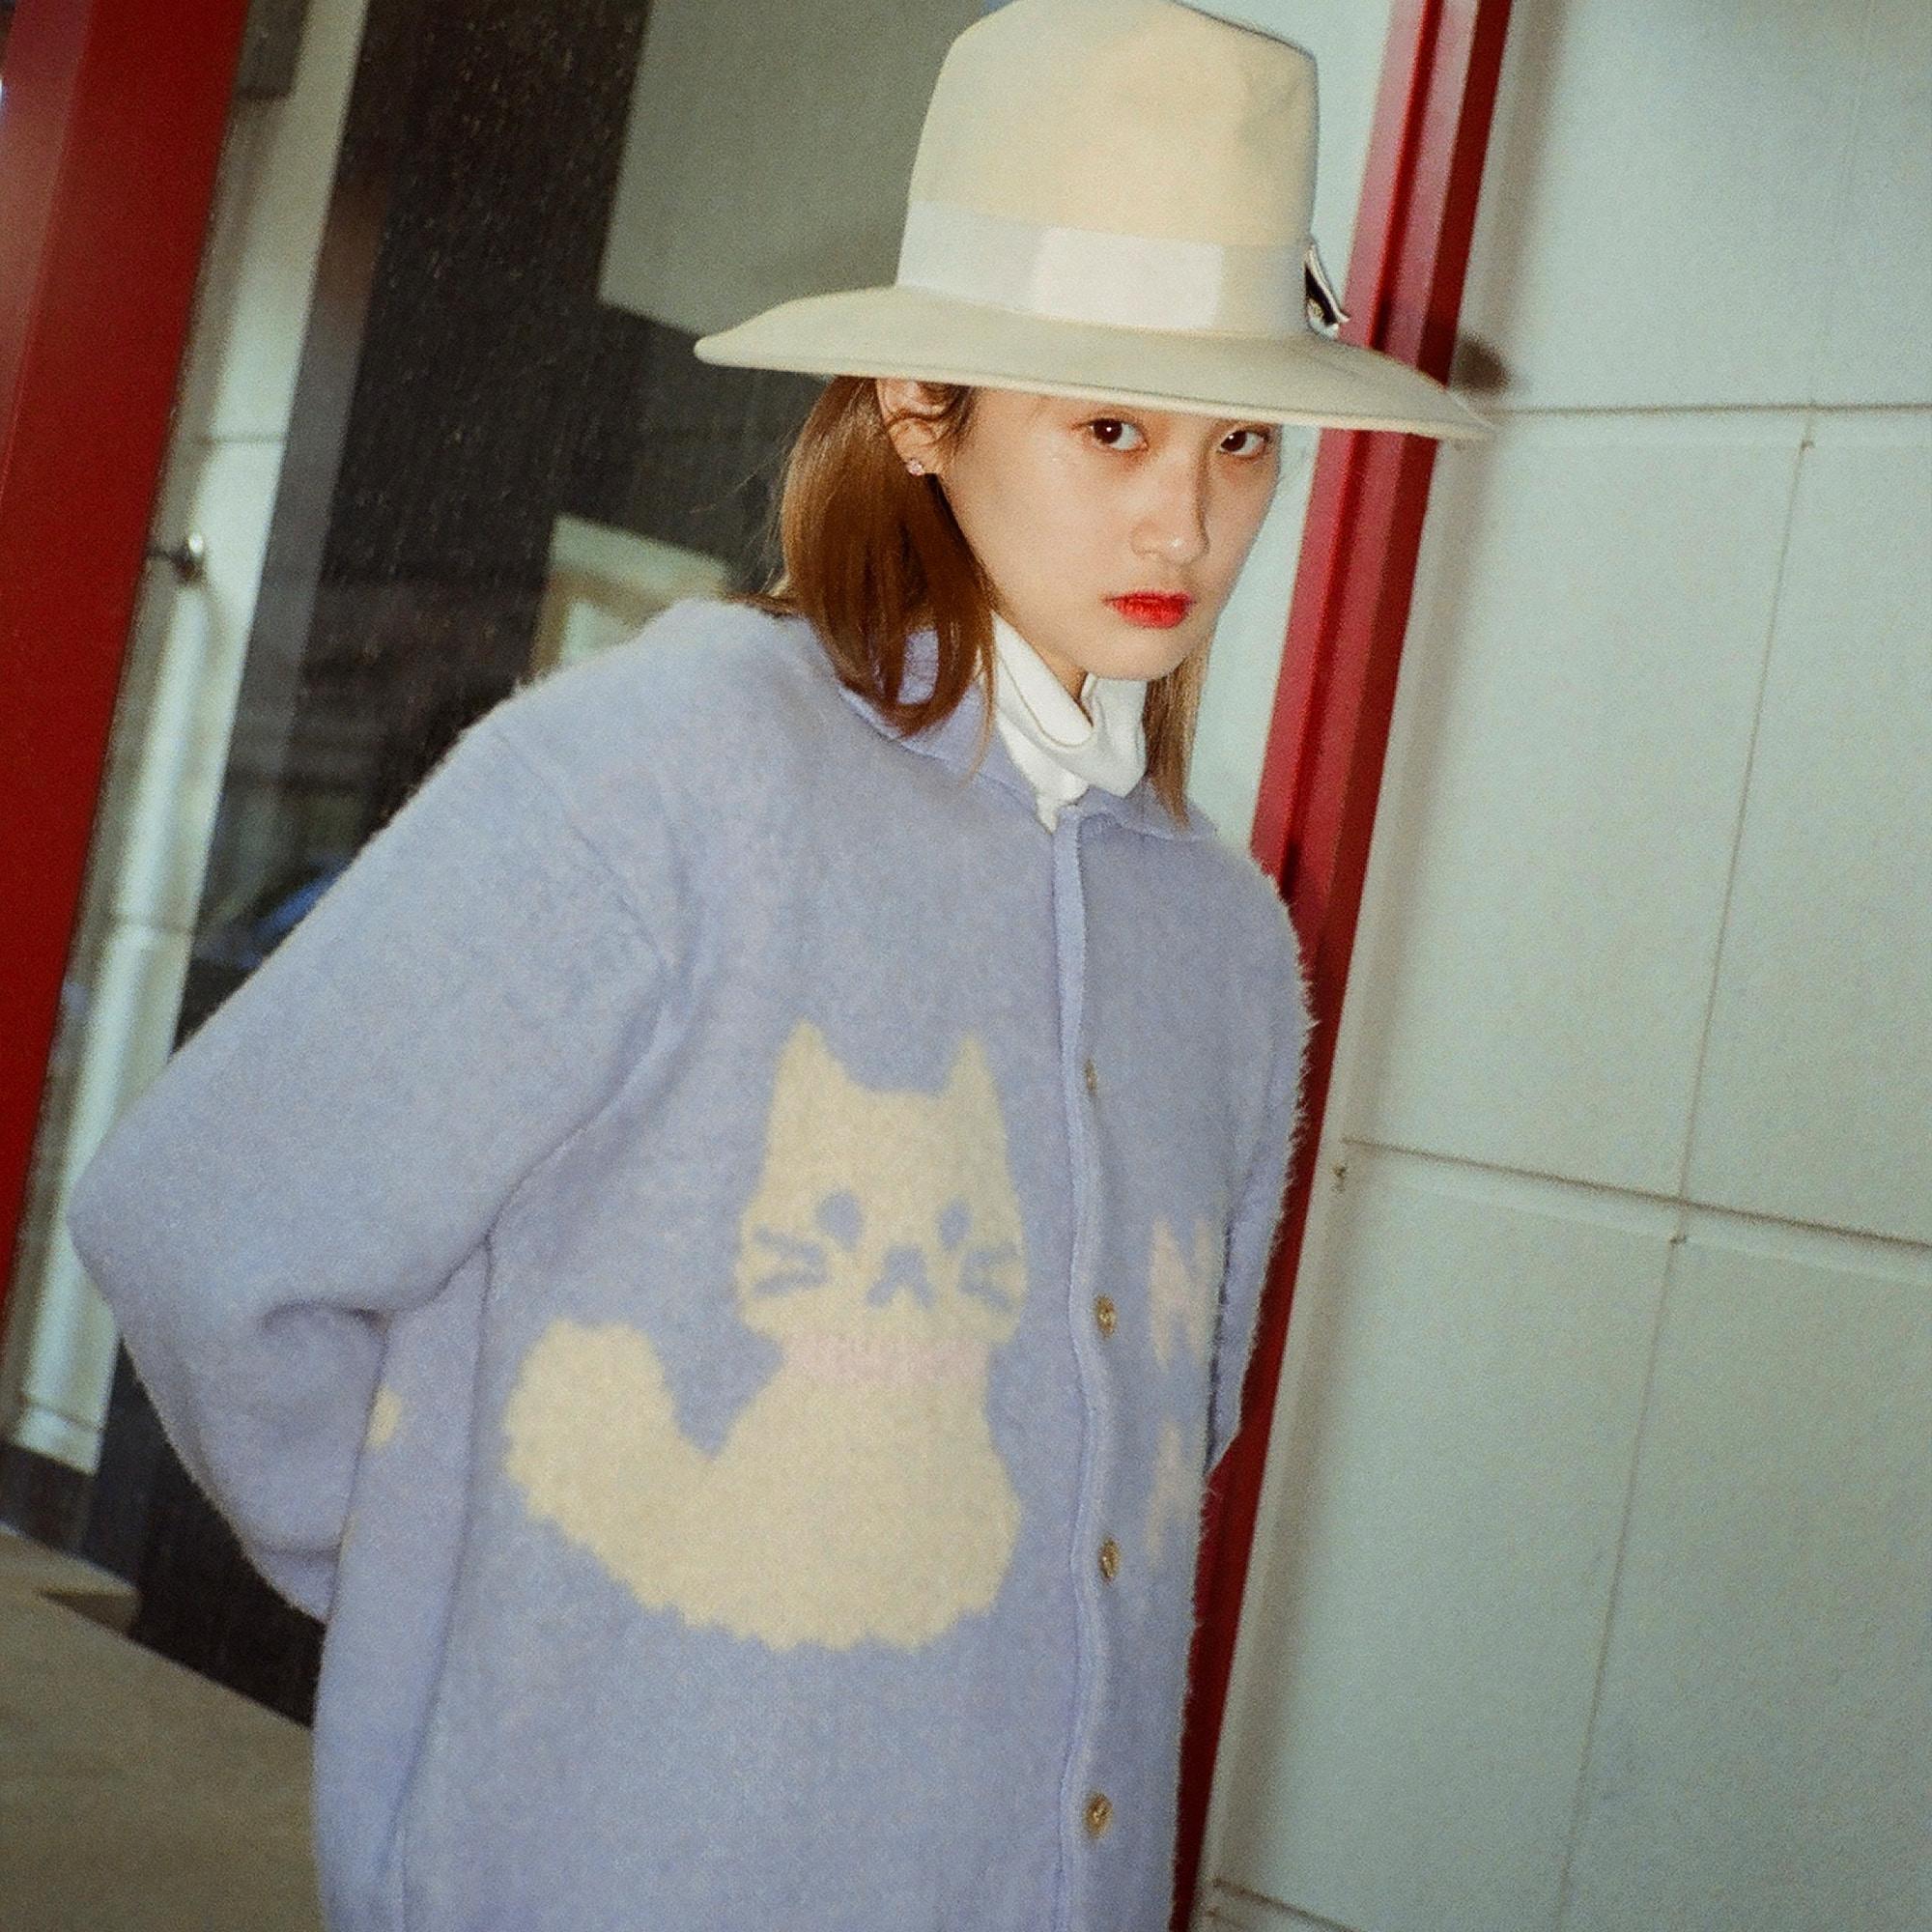 Cat Knit Cardigan (Baby Blue)